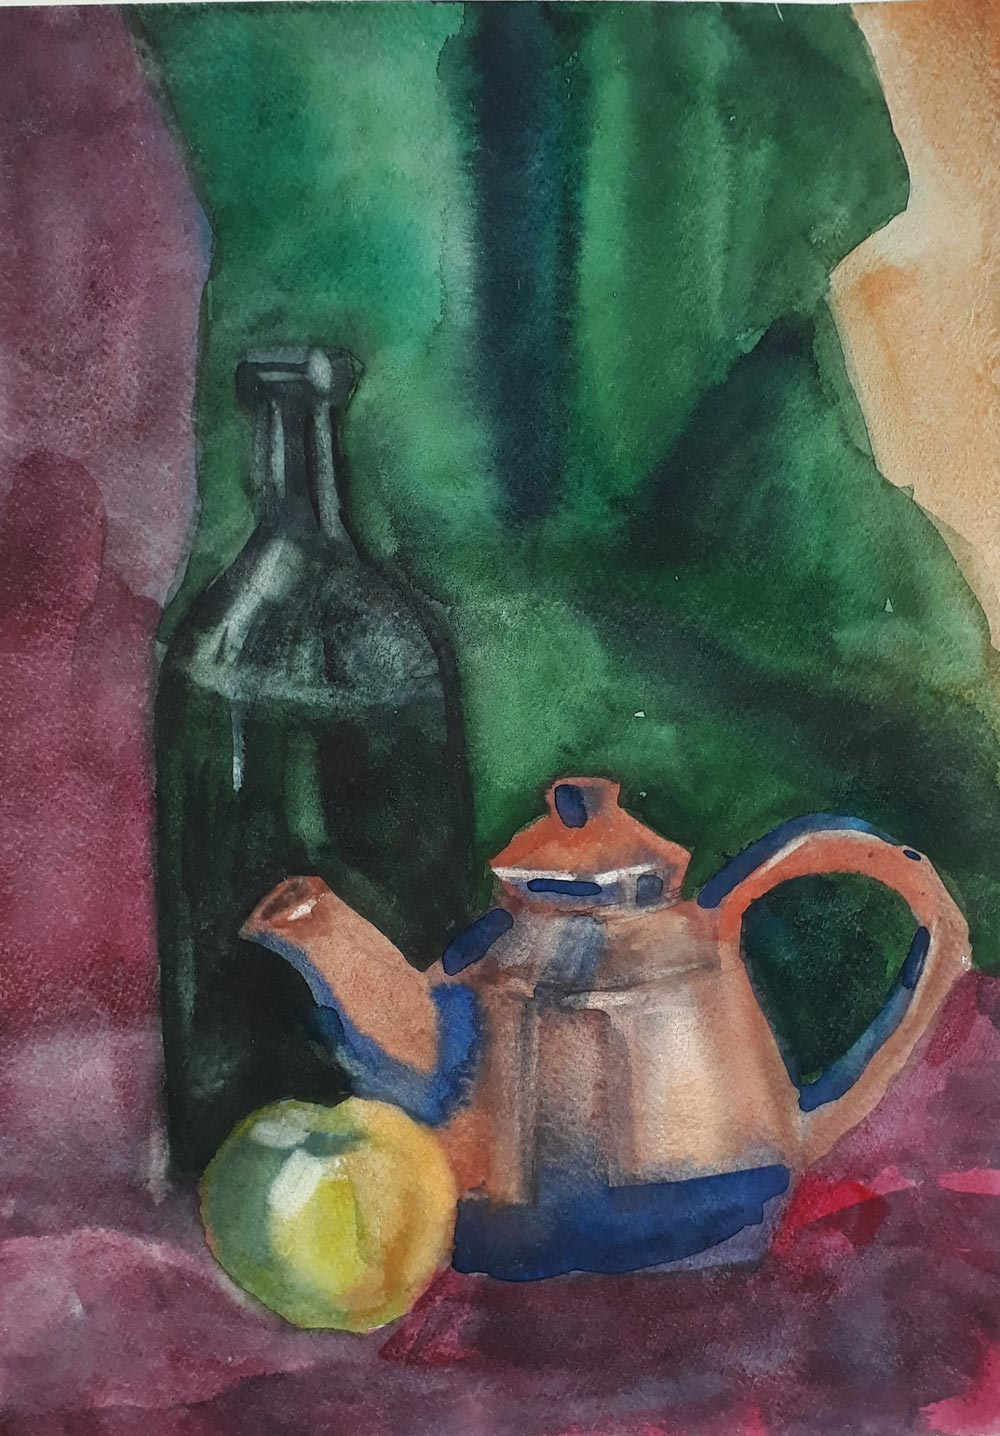 filippov-akvarel-11